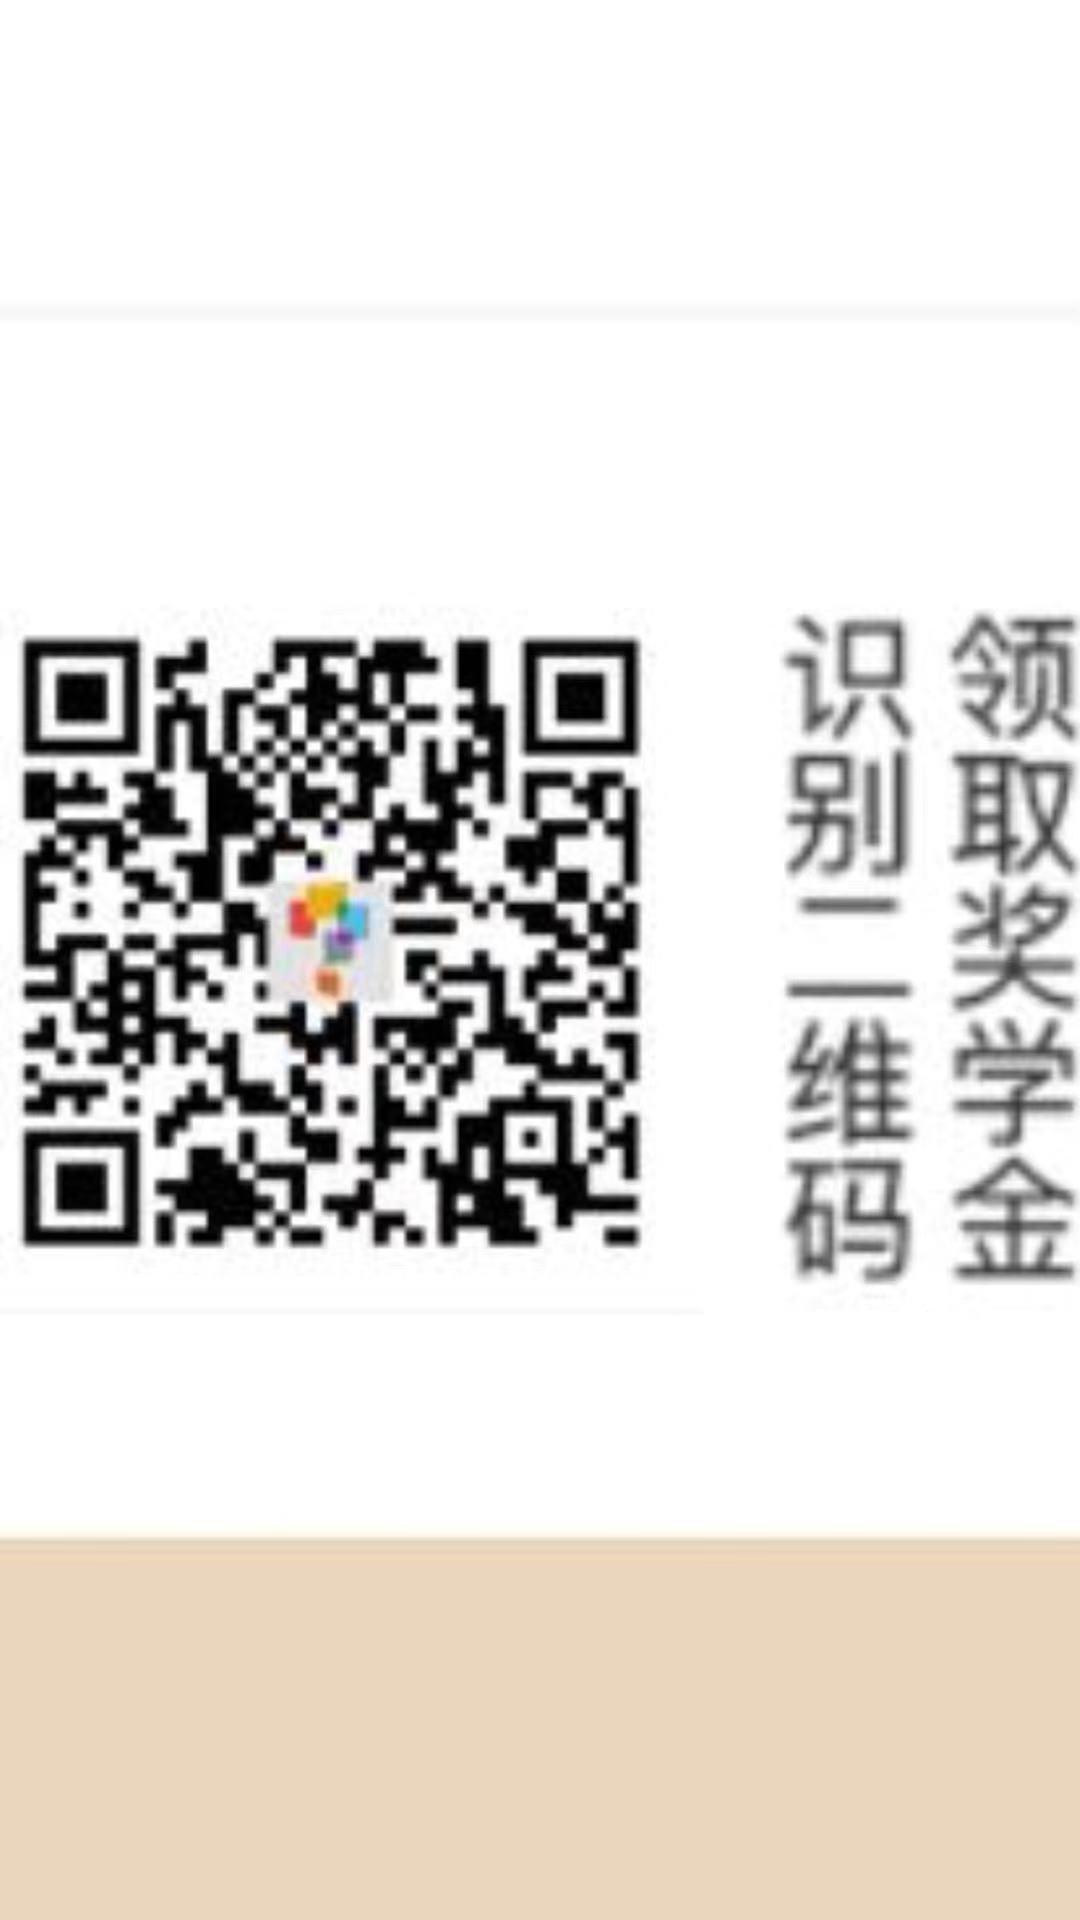 webwxgetmsgimg (4).jpg